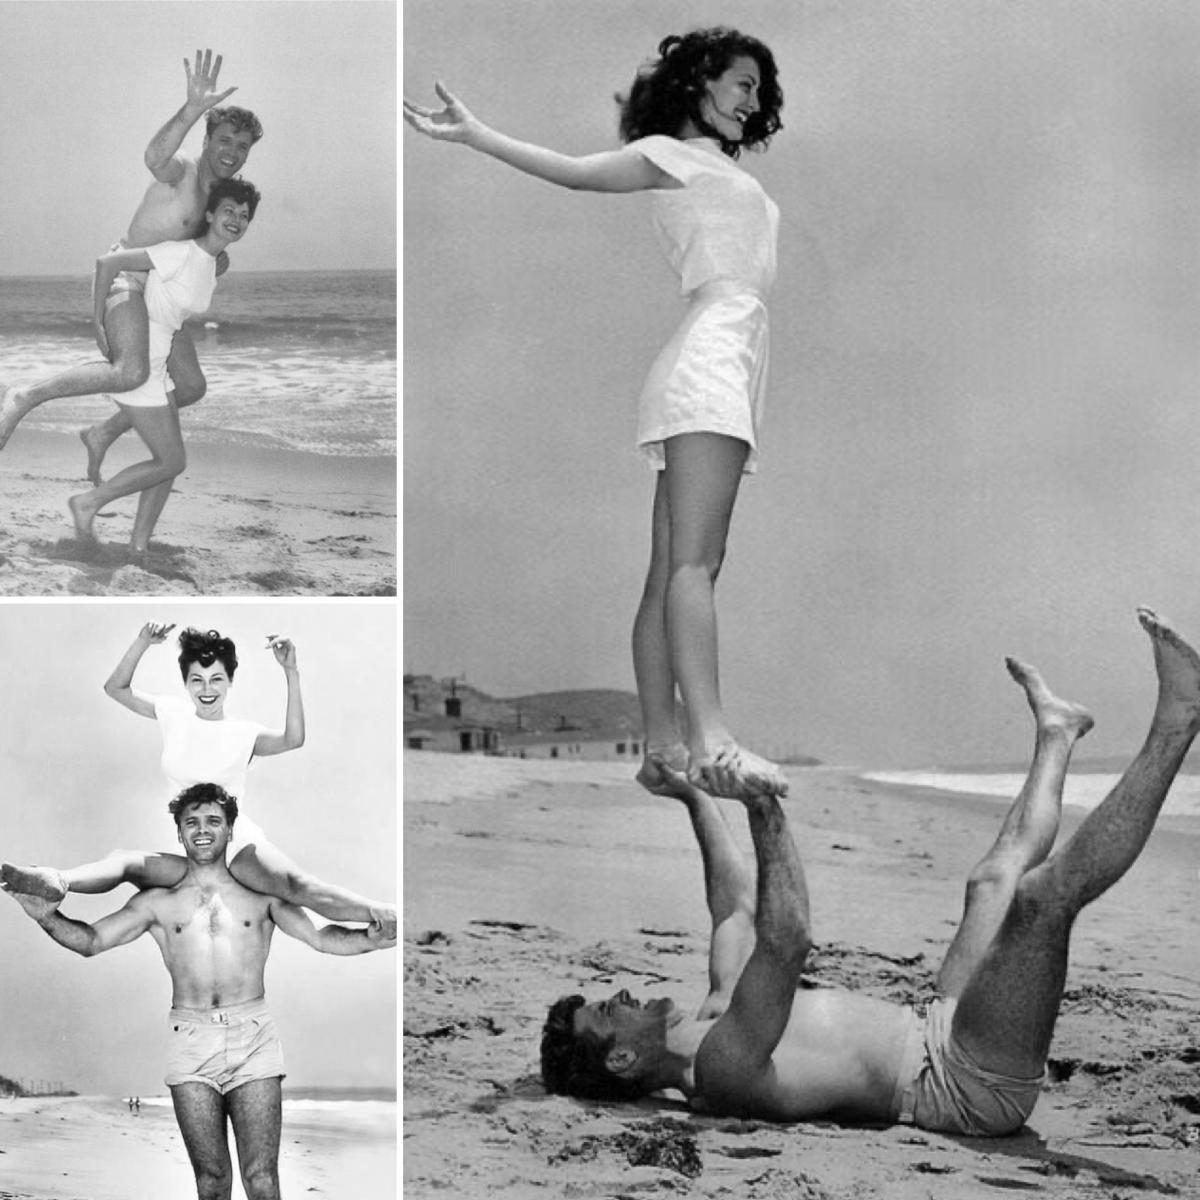 Ava Gardner and Burt Lancaster Publicity Photos on Beach